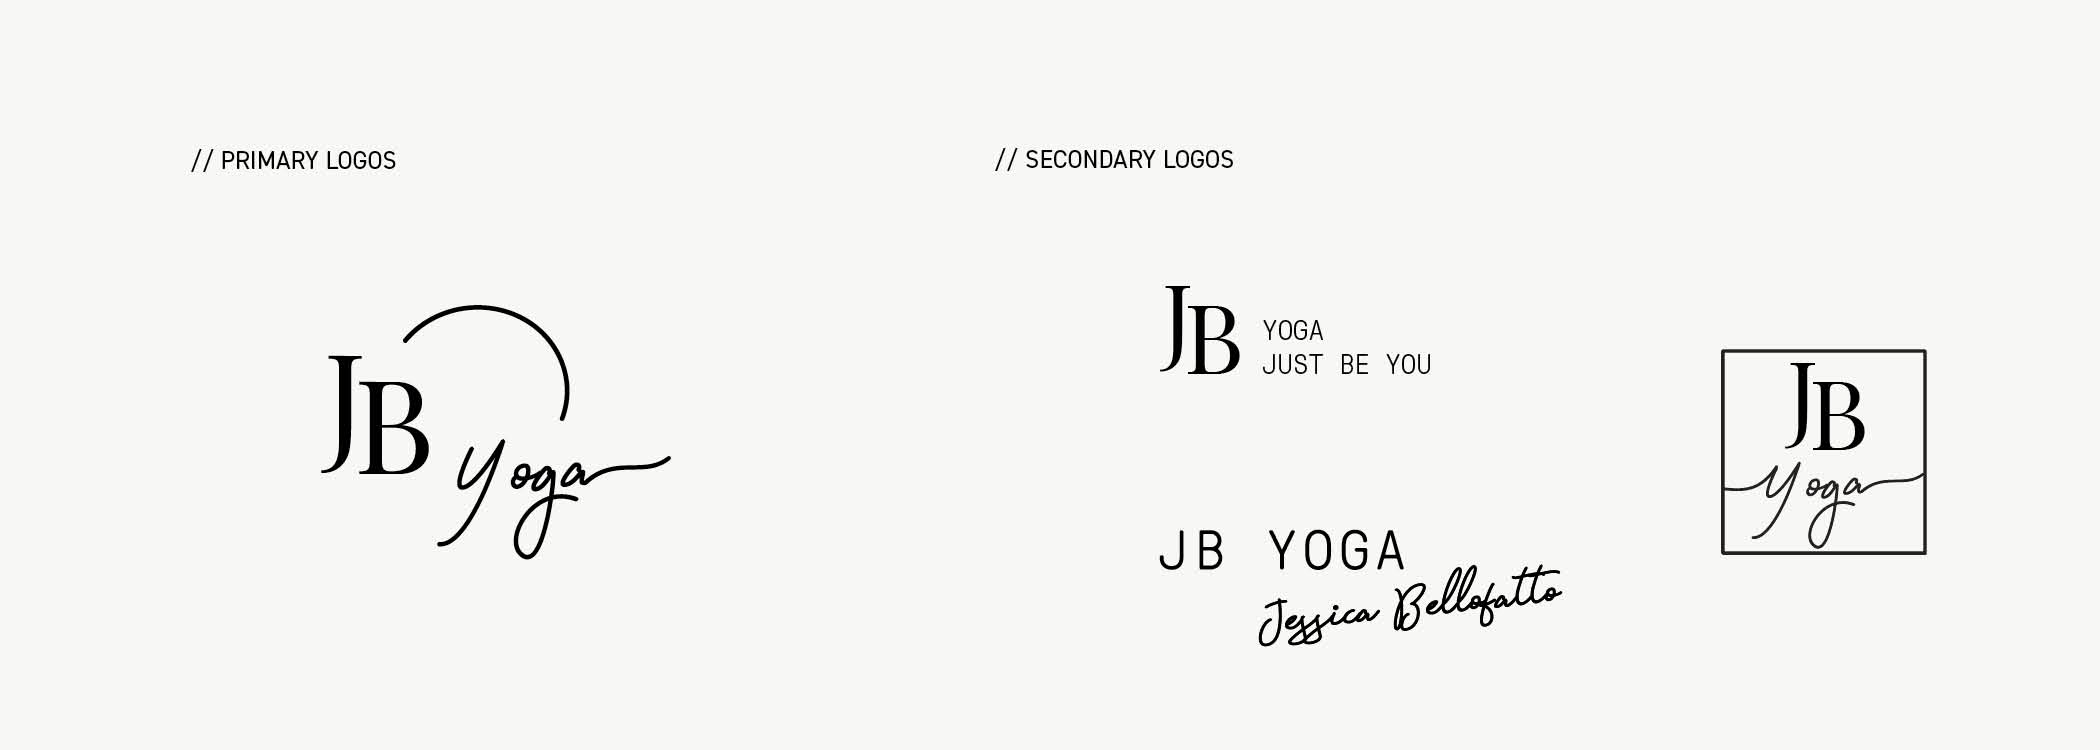 JB_YOGA_IDENTITY.jpg